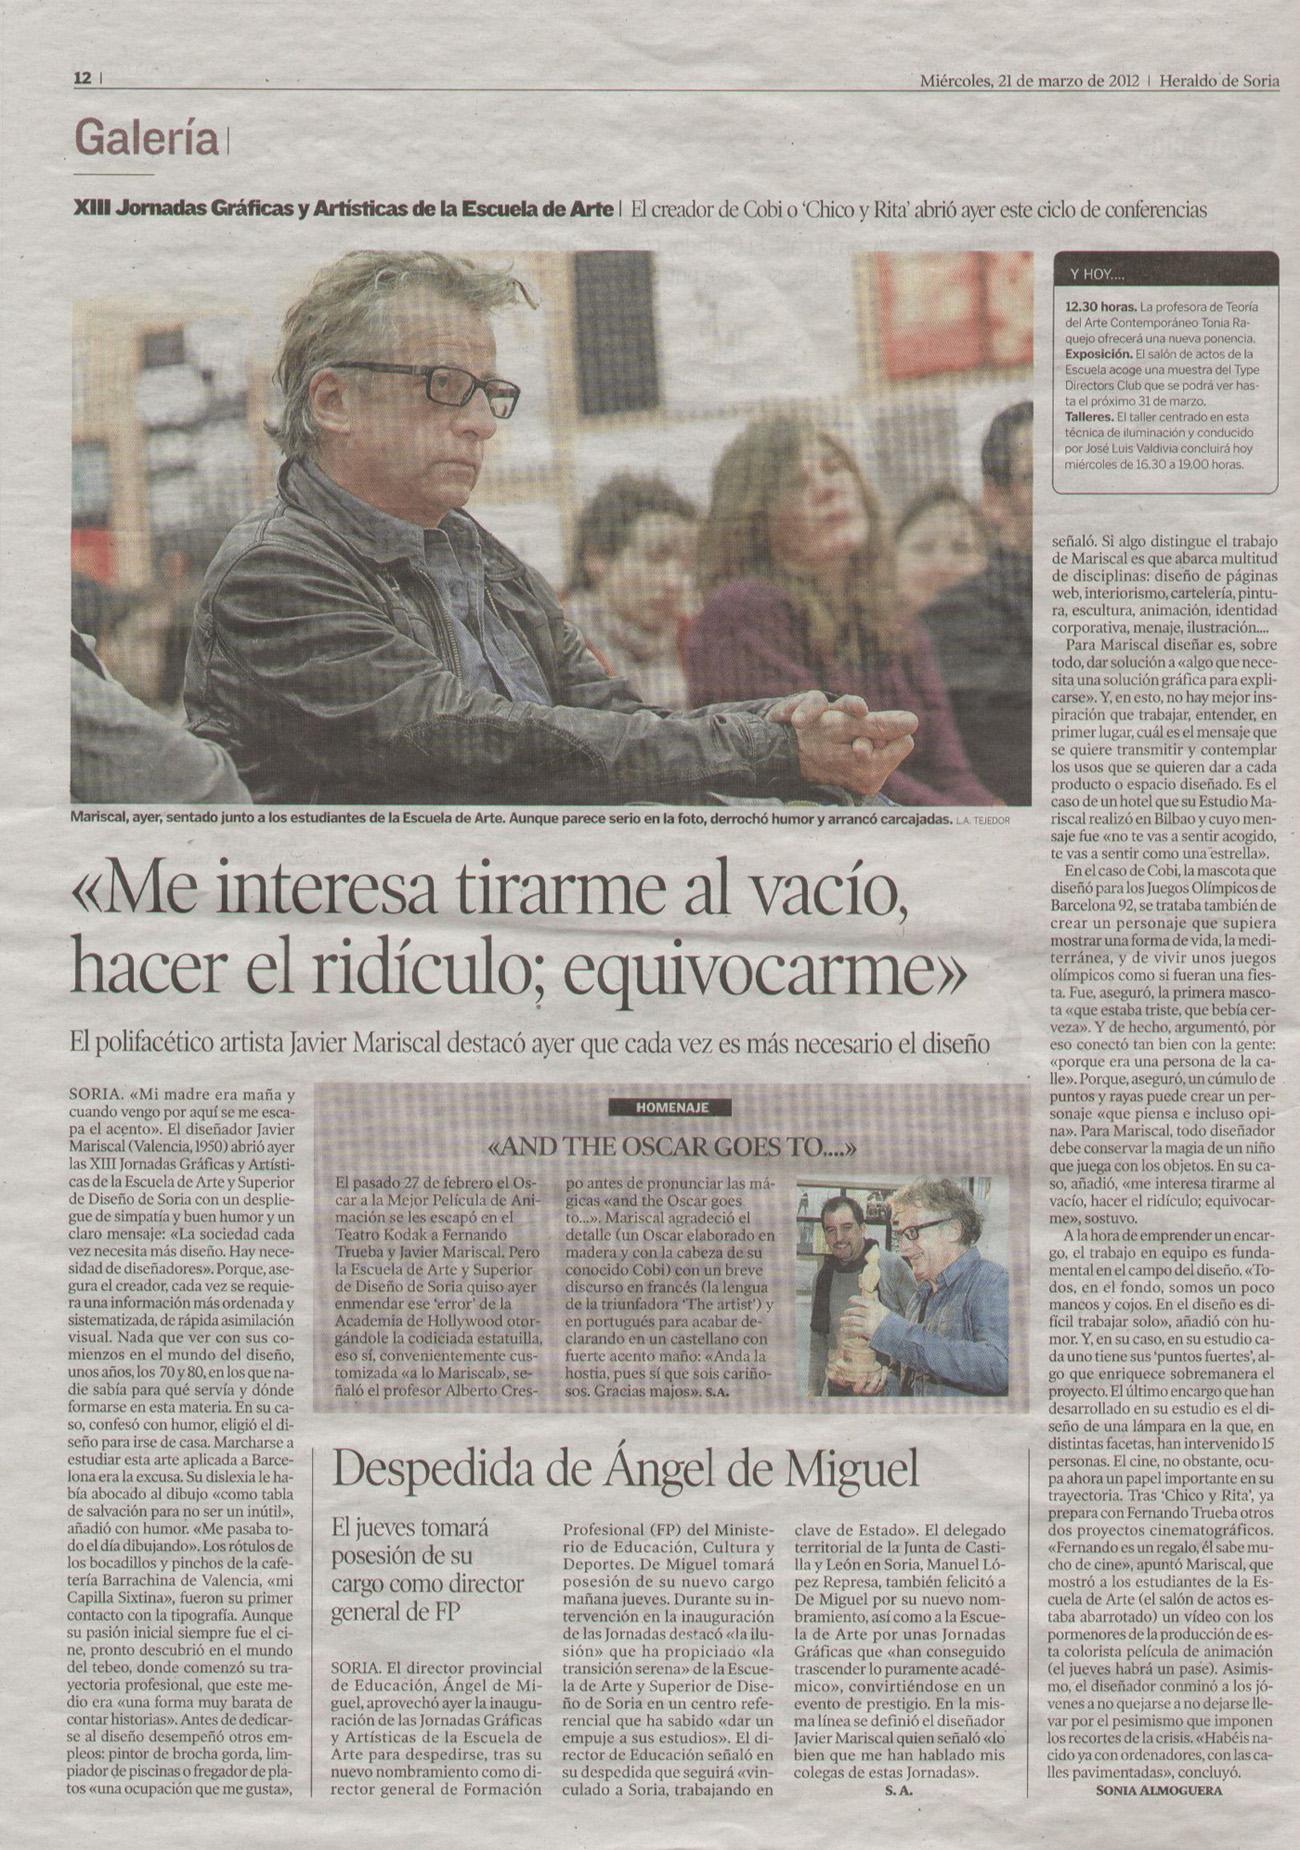 Información sobre Mariscal publicado en 'Heraldo de Soria' (Pincha para ampliar)